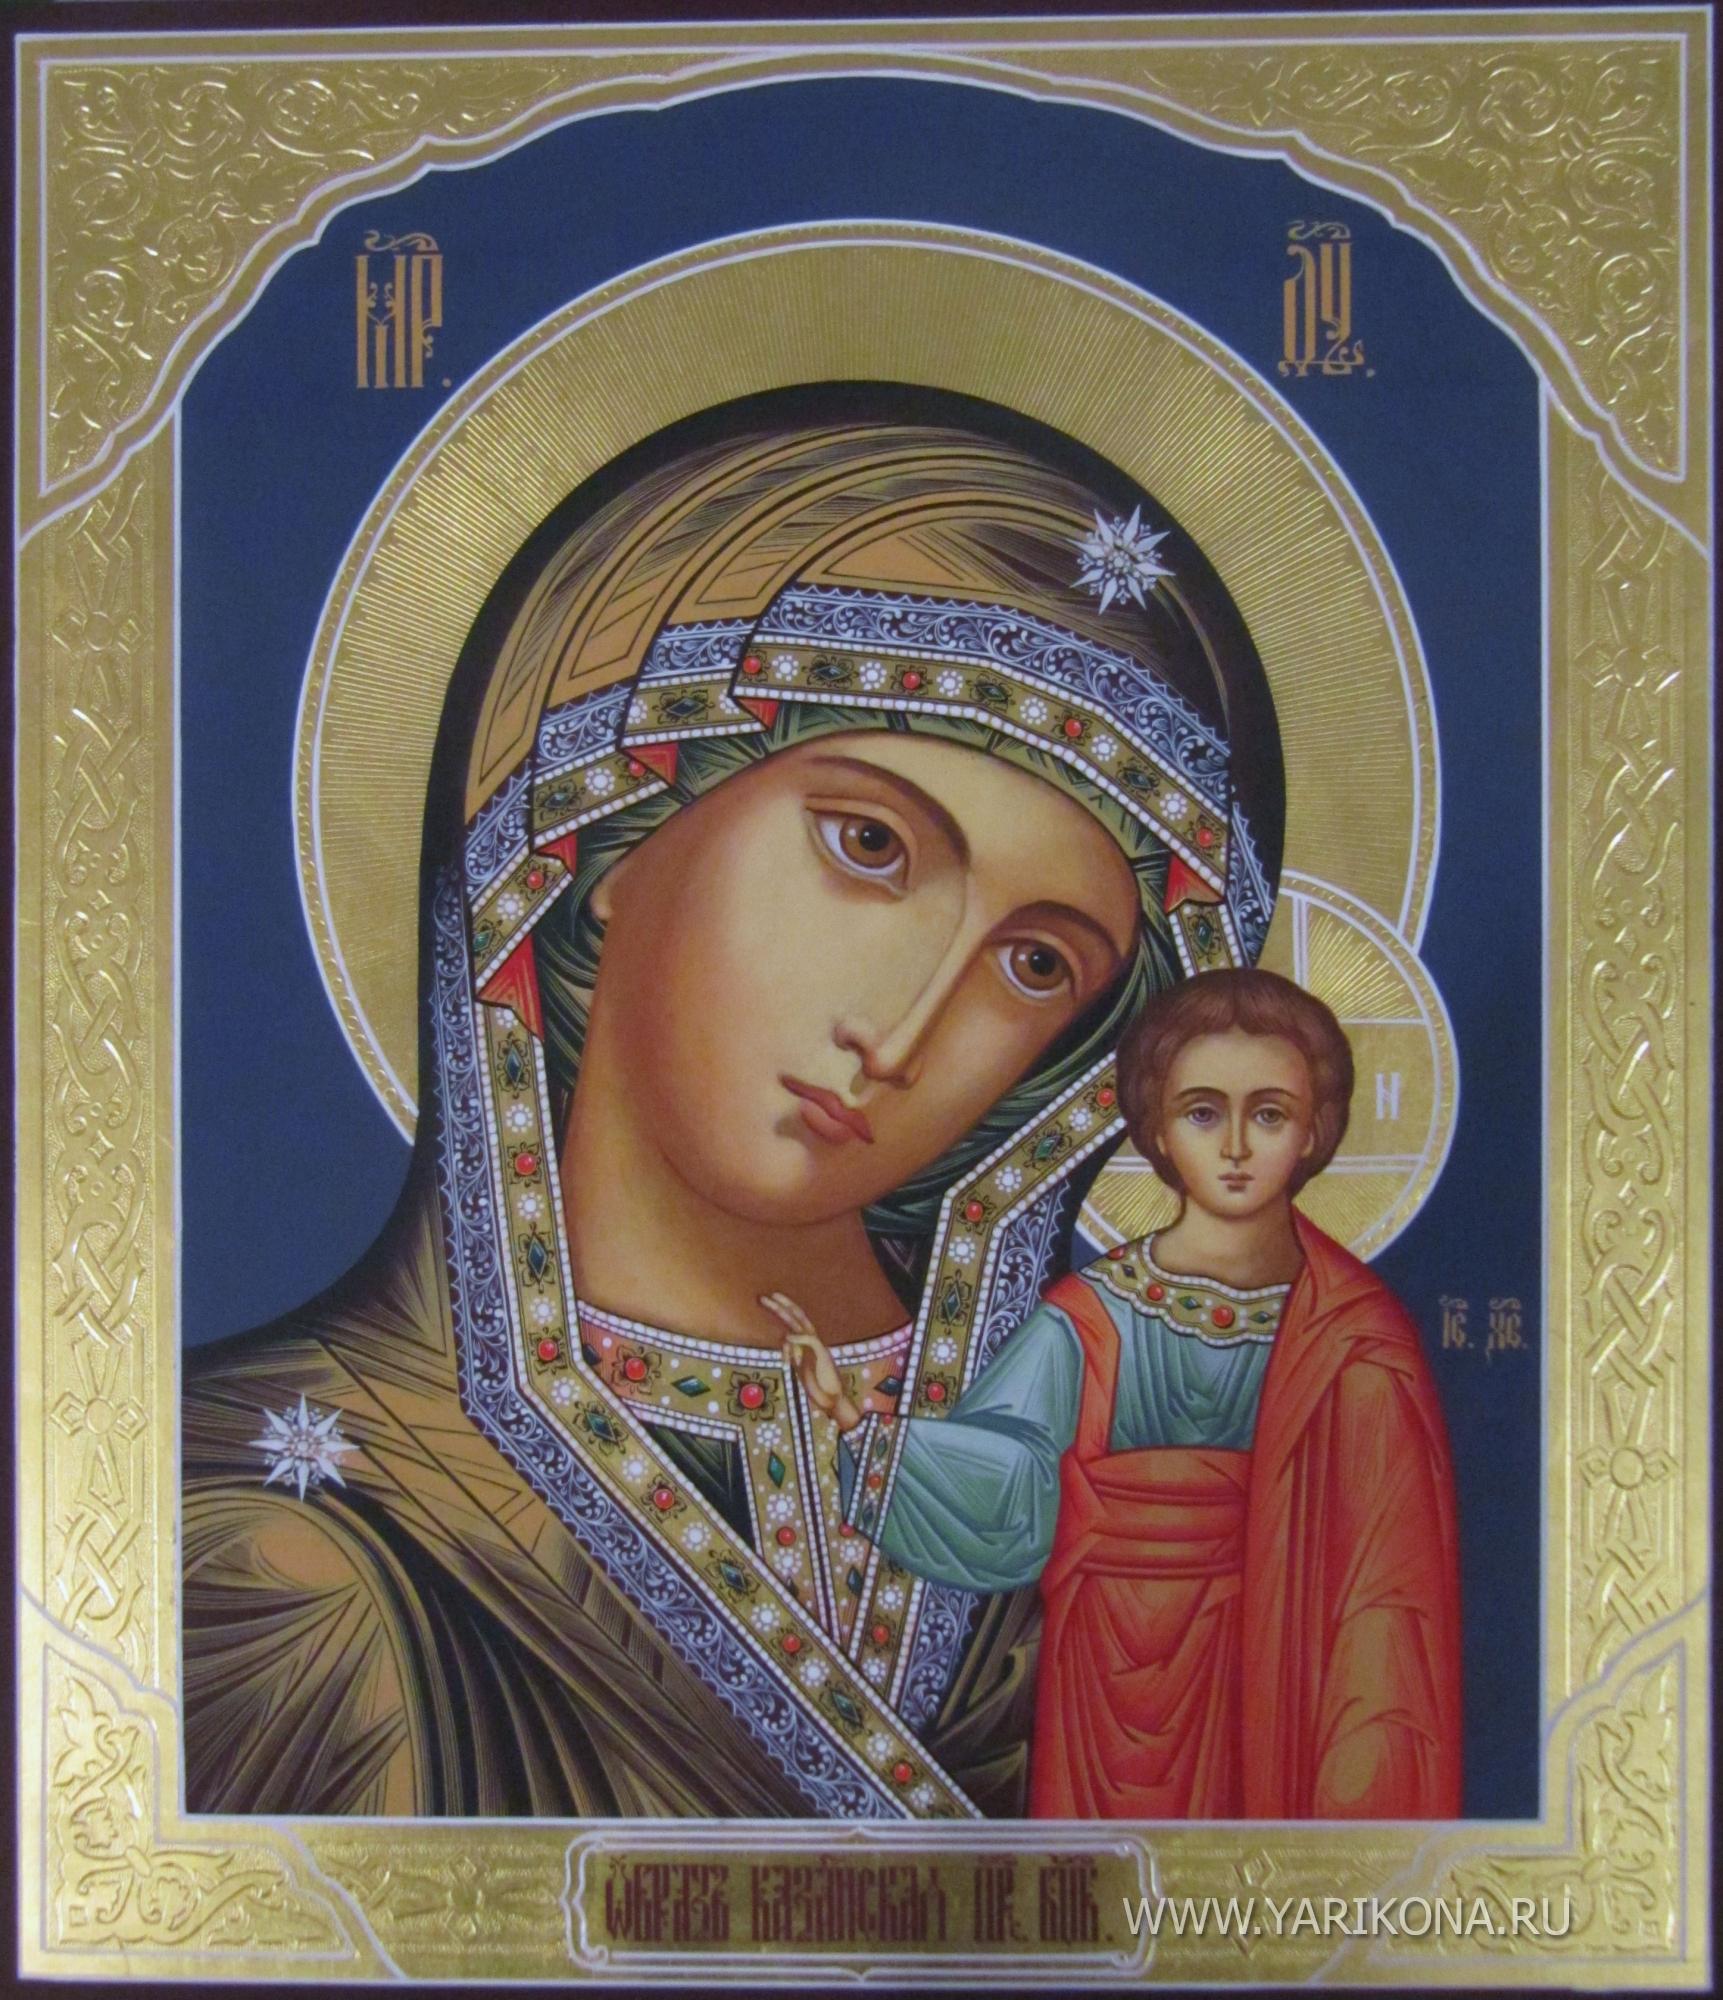 Казанская икона божией матери картинки, маришке открытки